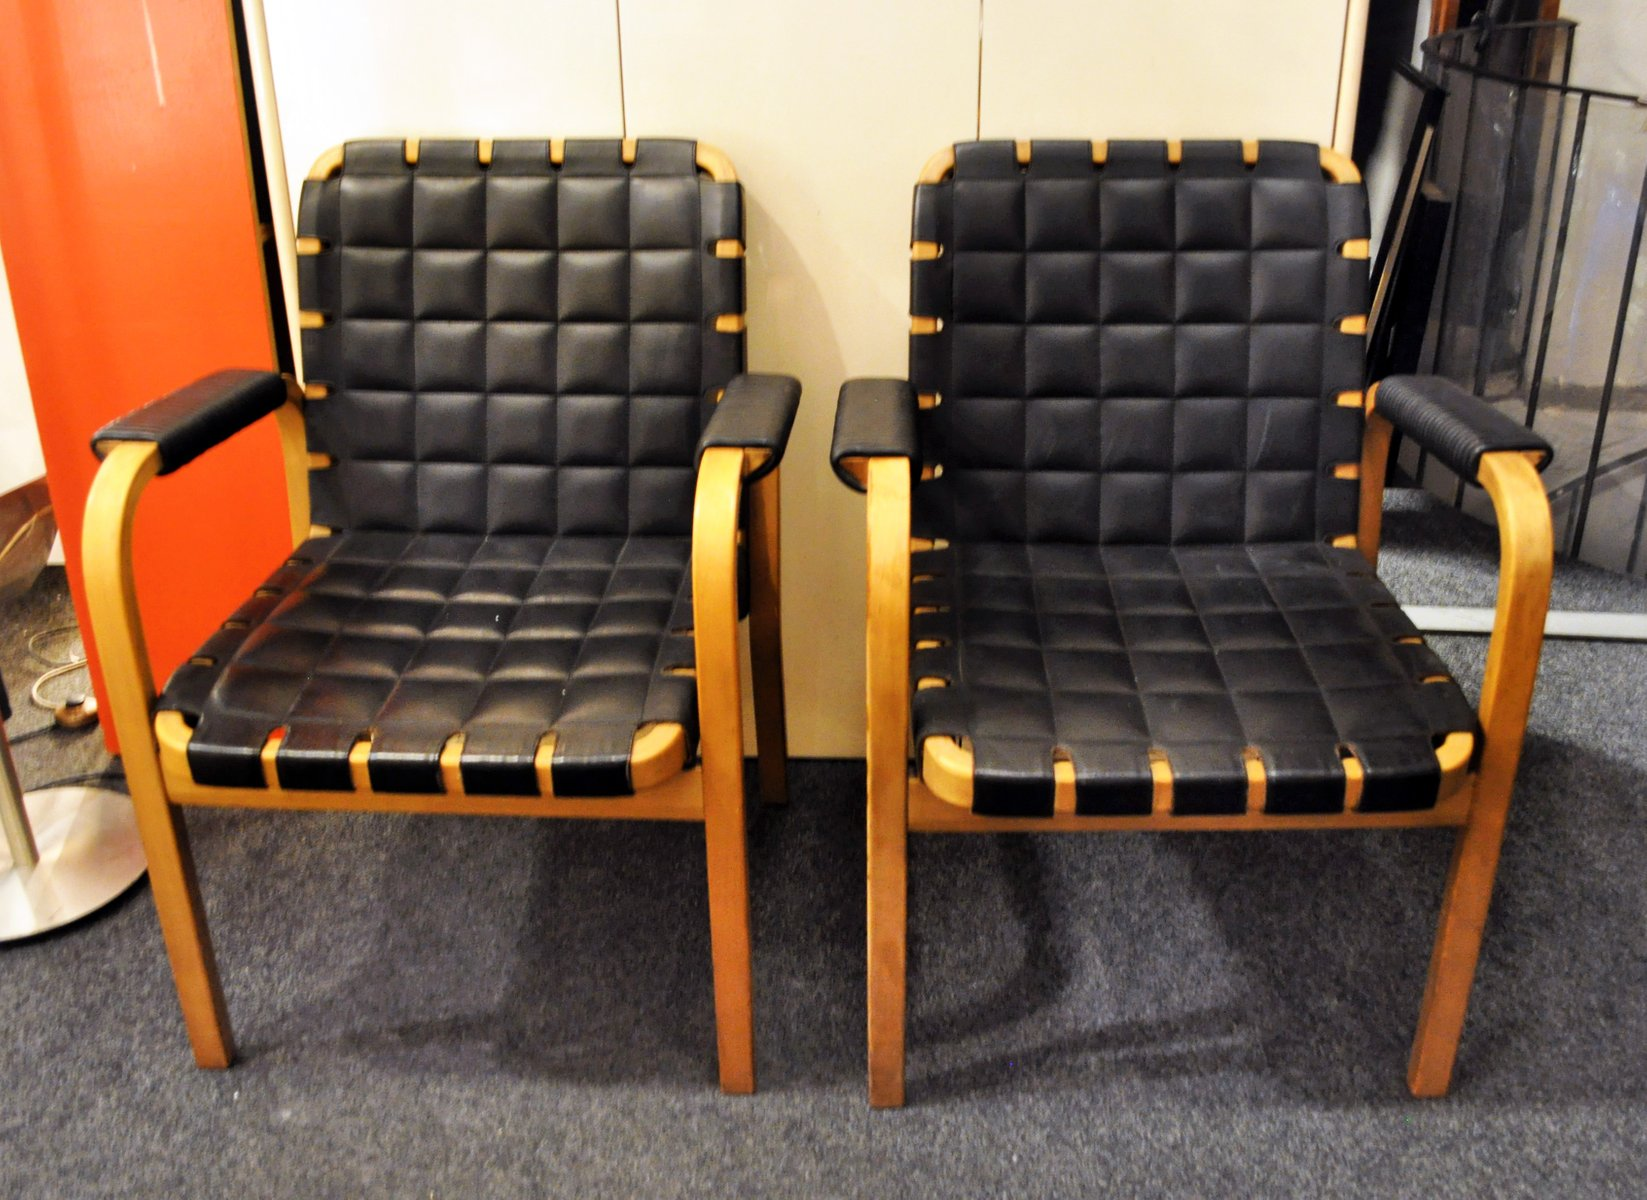 modell 46 sessel von alvar aalto f r artek 1947 2er set bei pamono kaufen. Black Bedroom Furniture Sets. Home Design Ideas